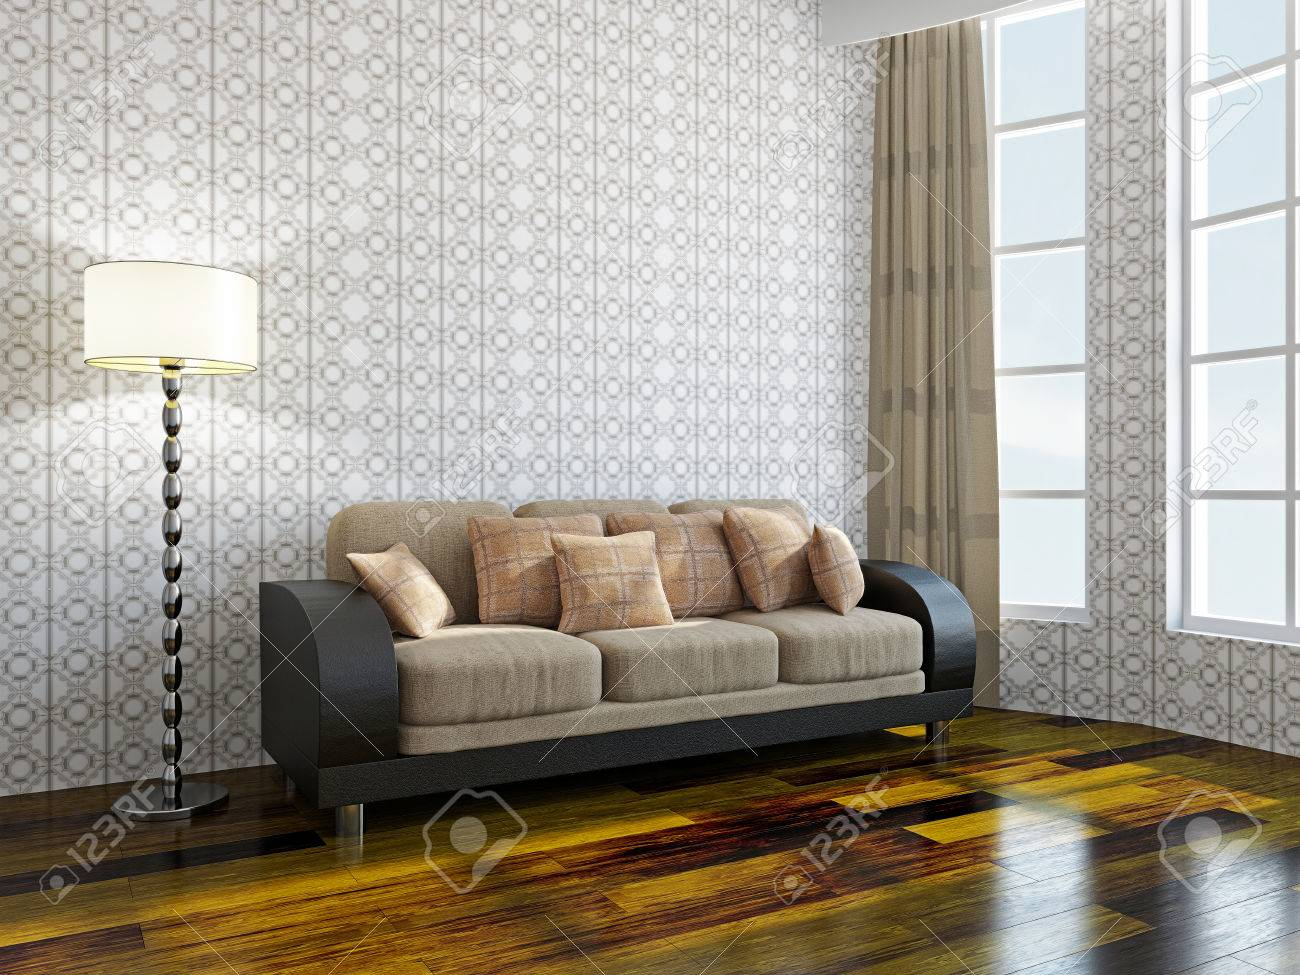 Sofa with pillows near a window Stock Photo - 22252179